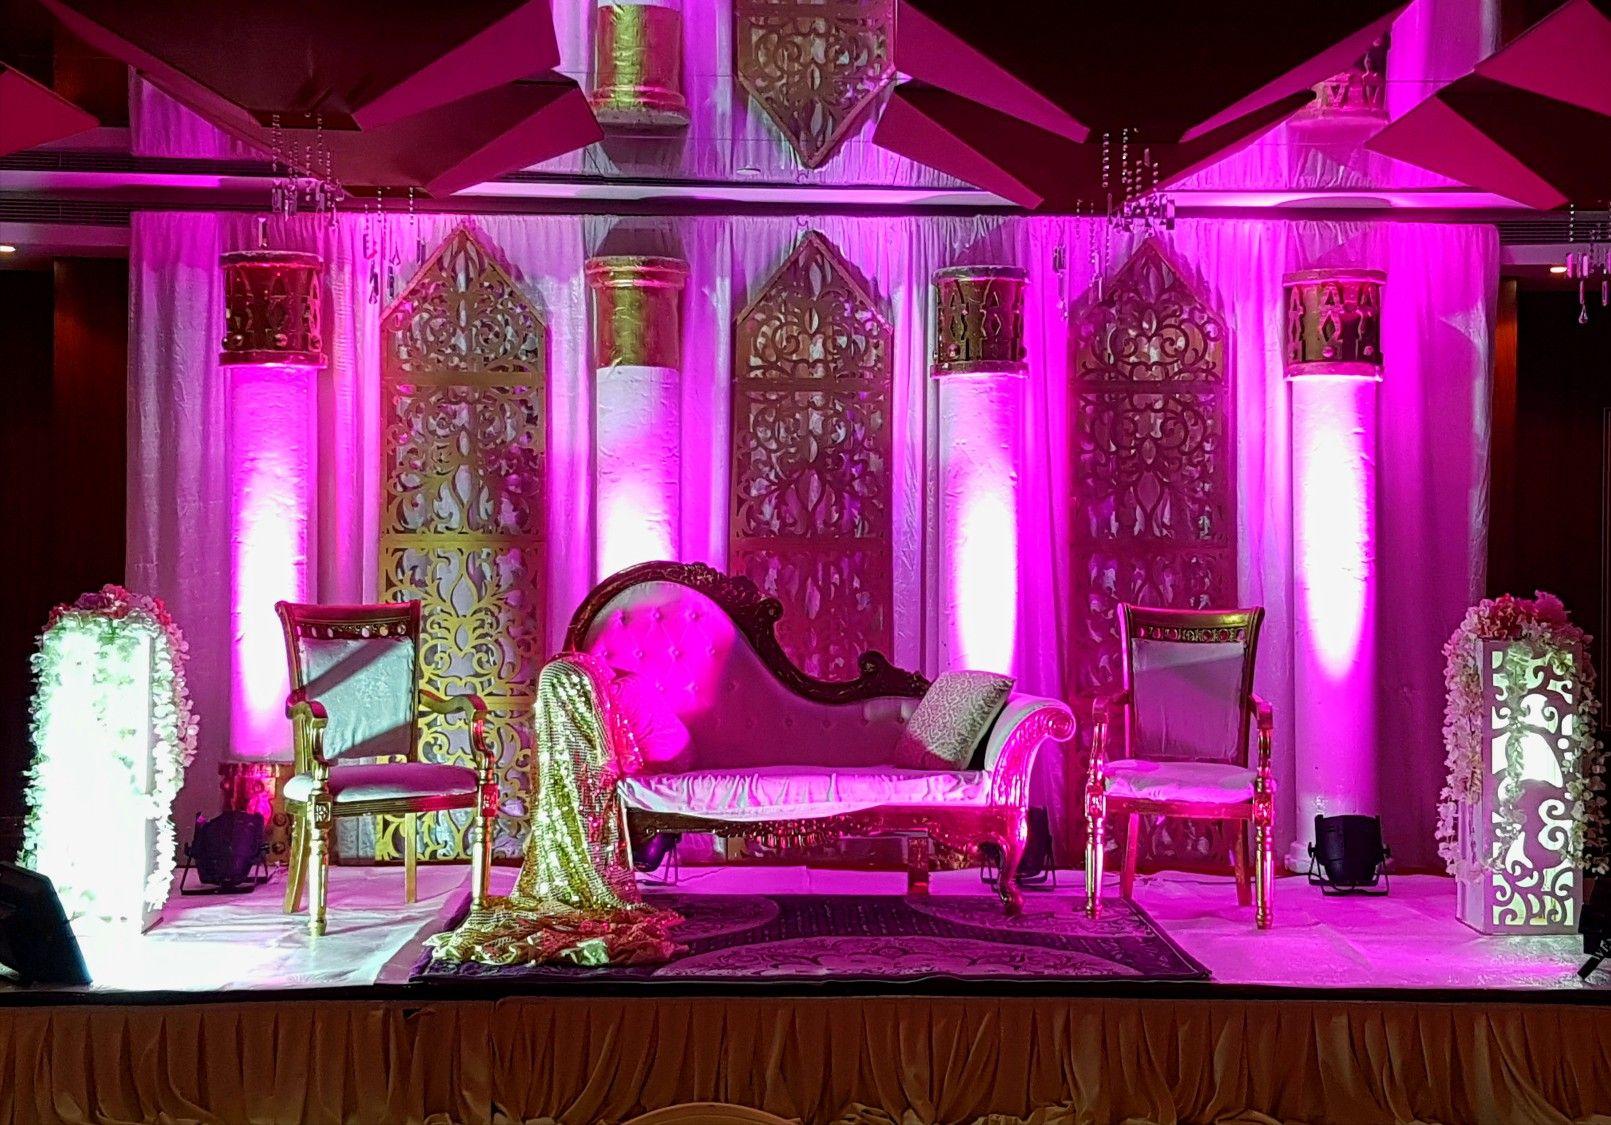 Simple Weddingroyal Small Decorationkoshawedding Stageelegant